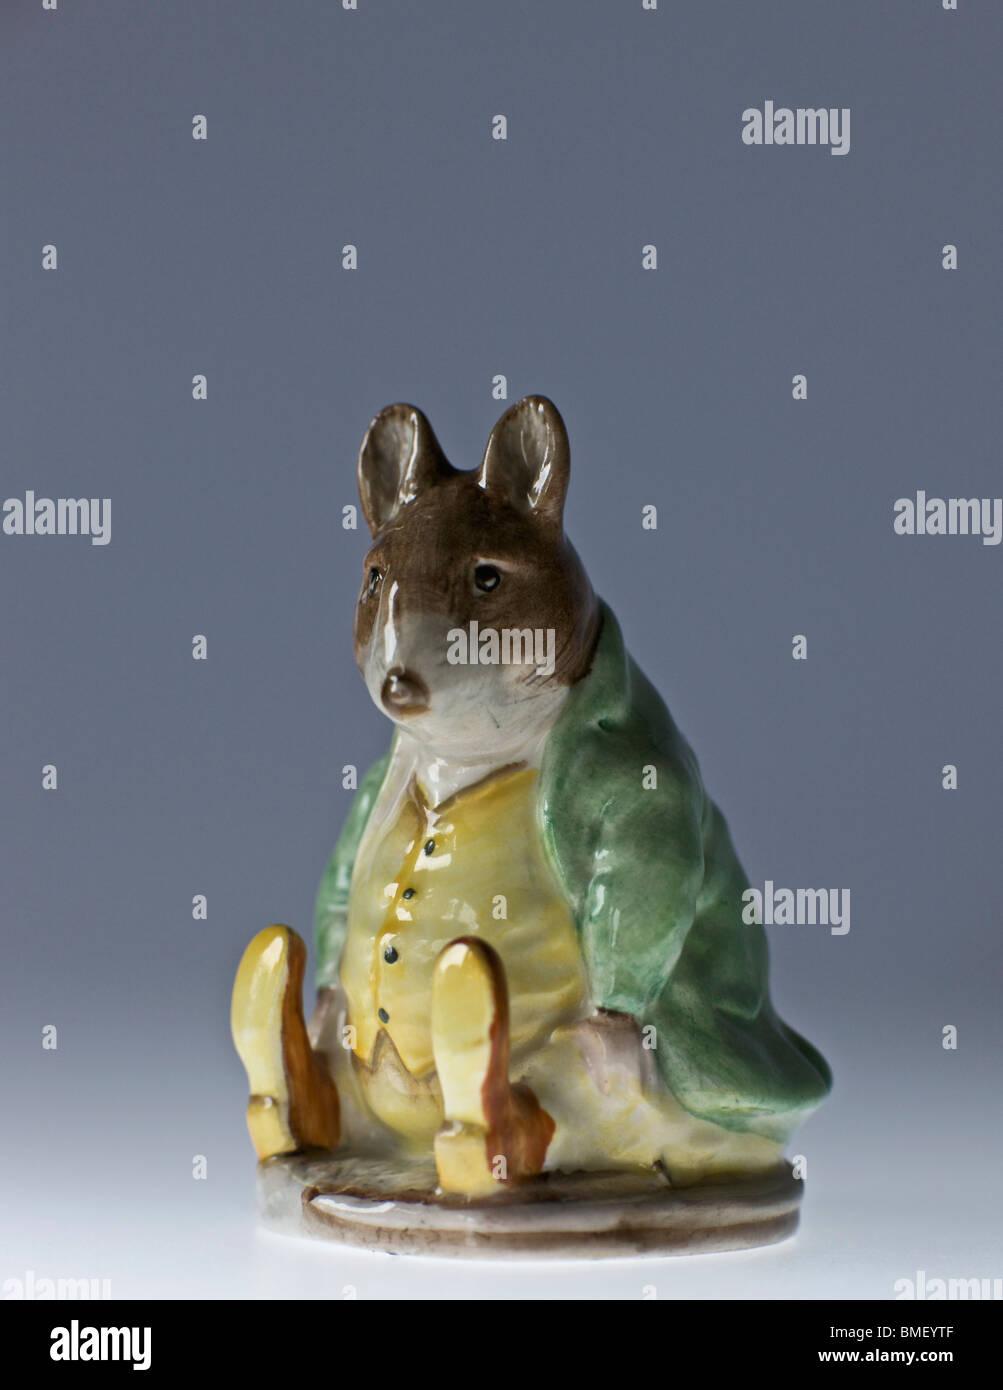 Samuel Whiskers - Beatrix Potter figures - Stock Image